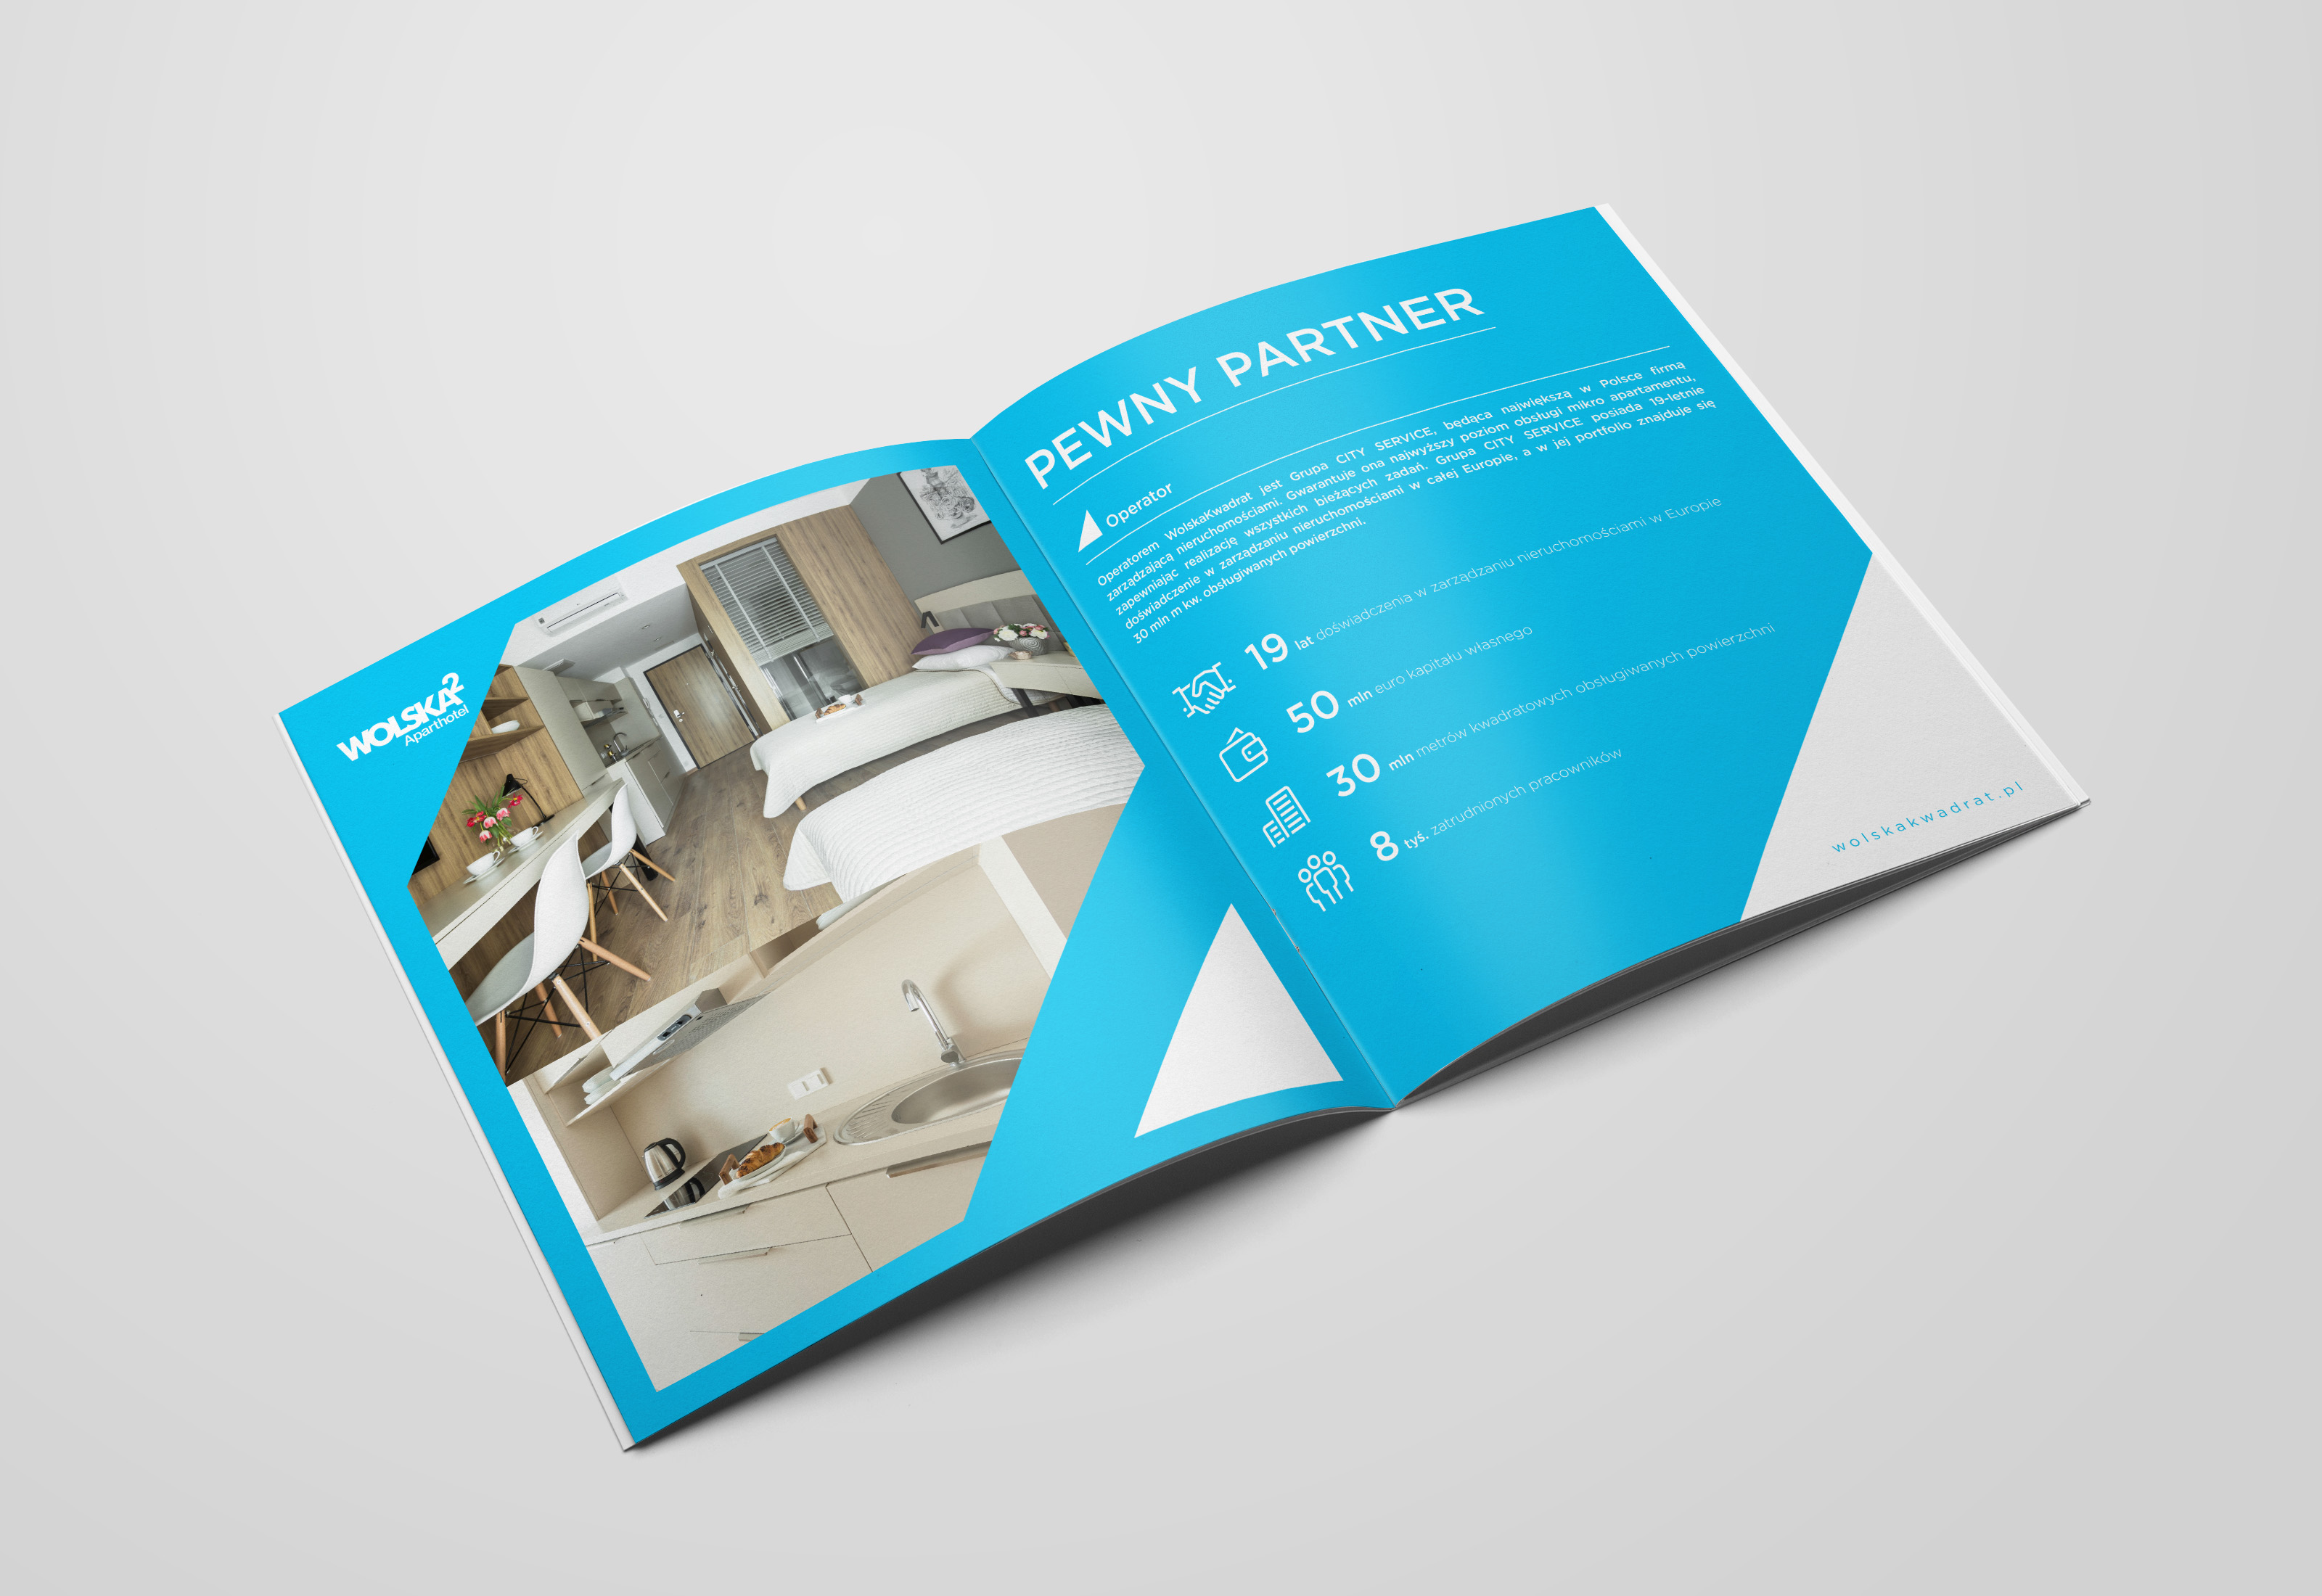 Wolska Kwadrat Property brochure design